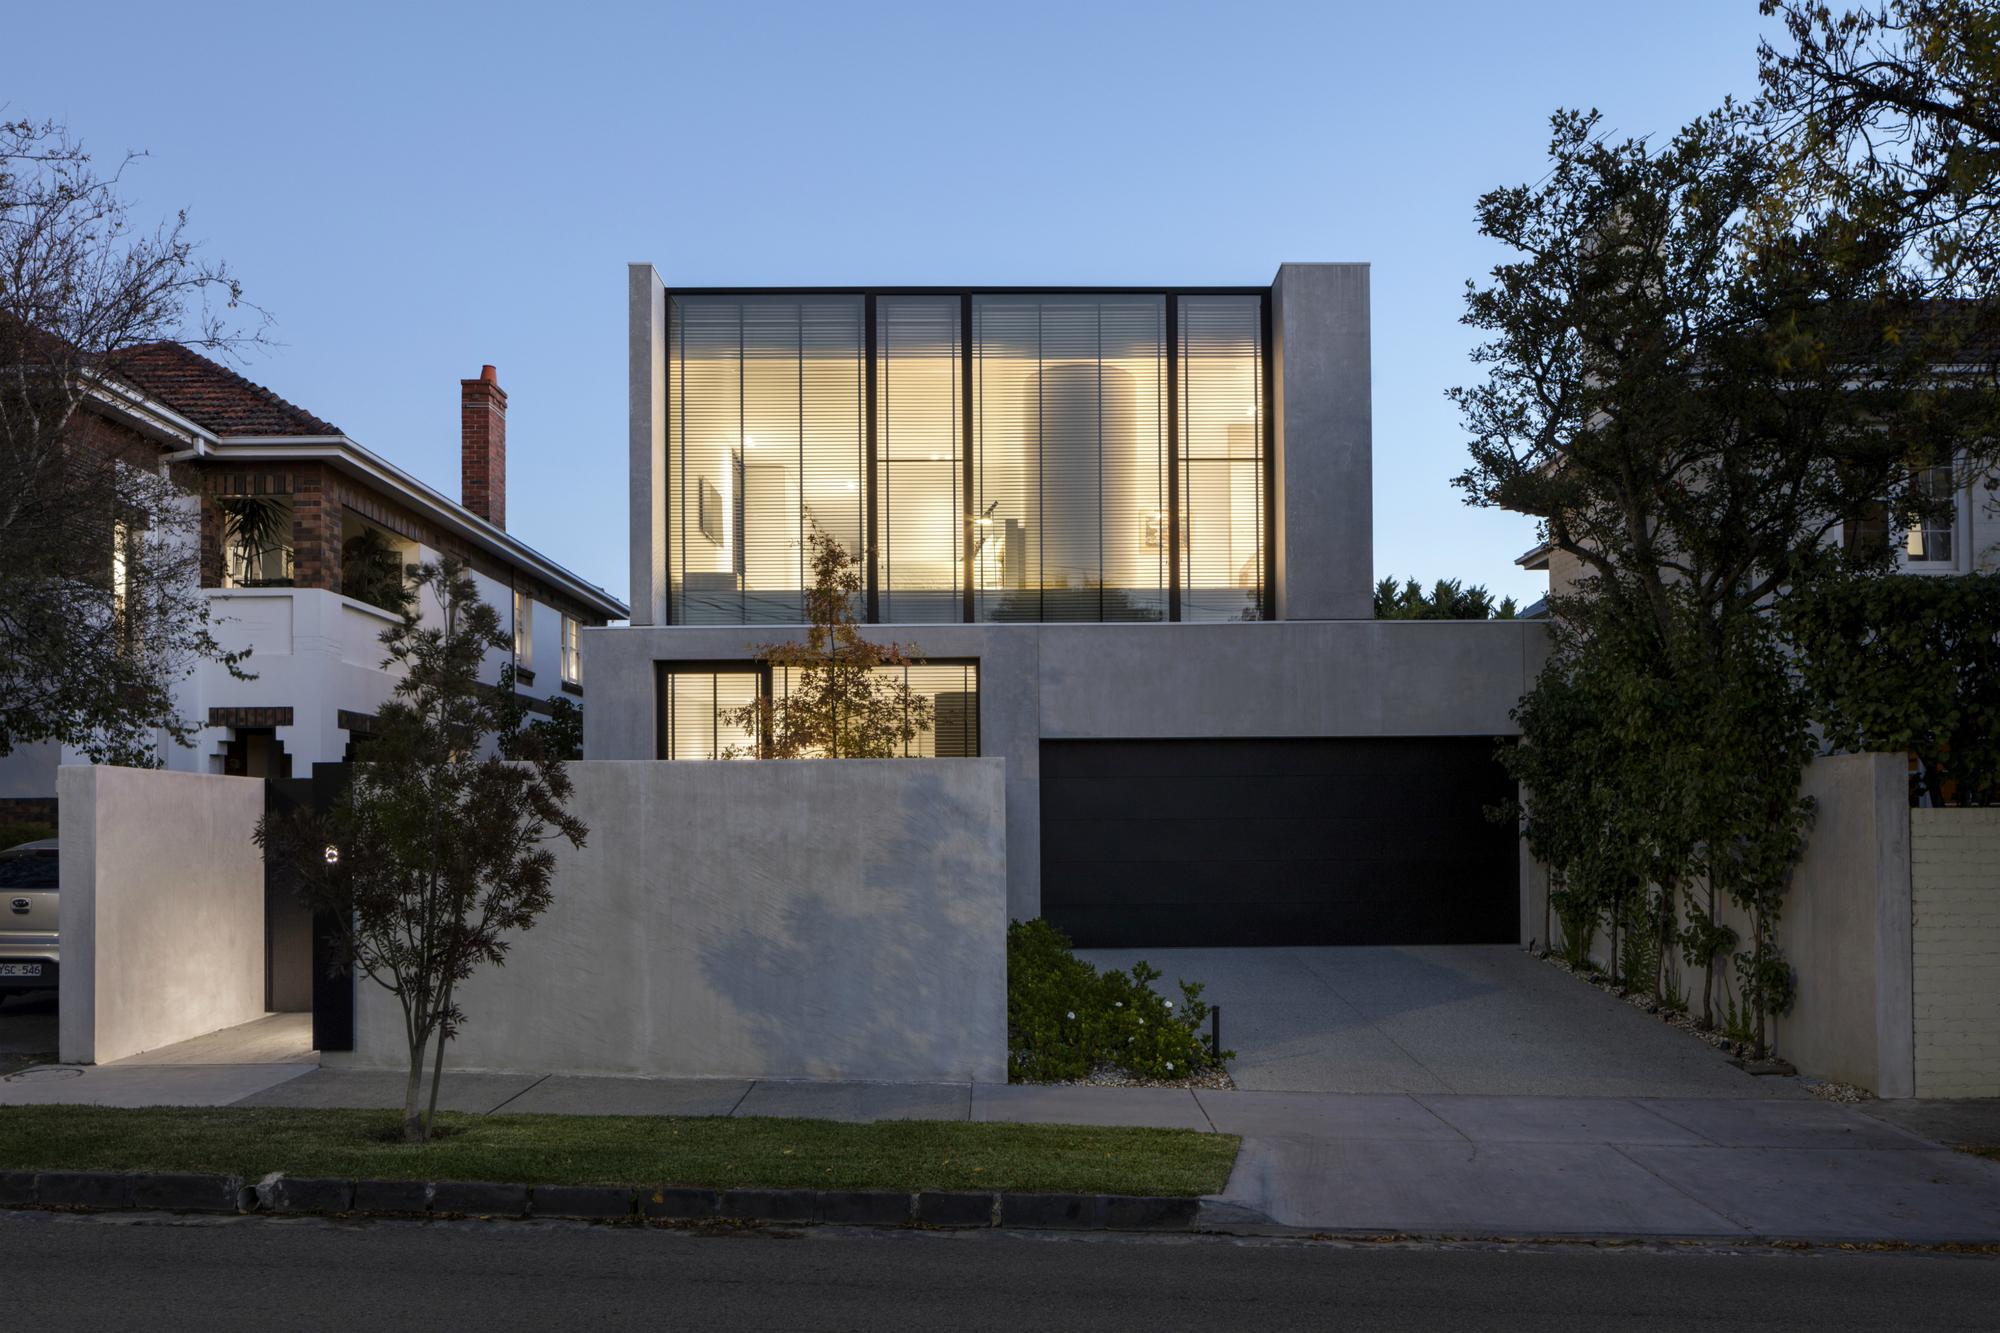 lsd residence davidov partners architects archdaily